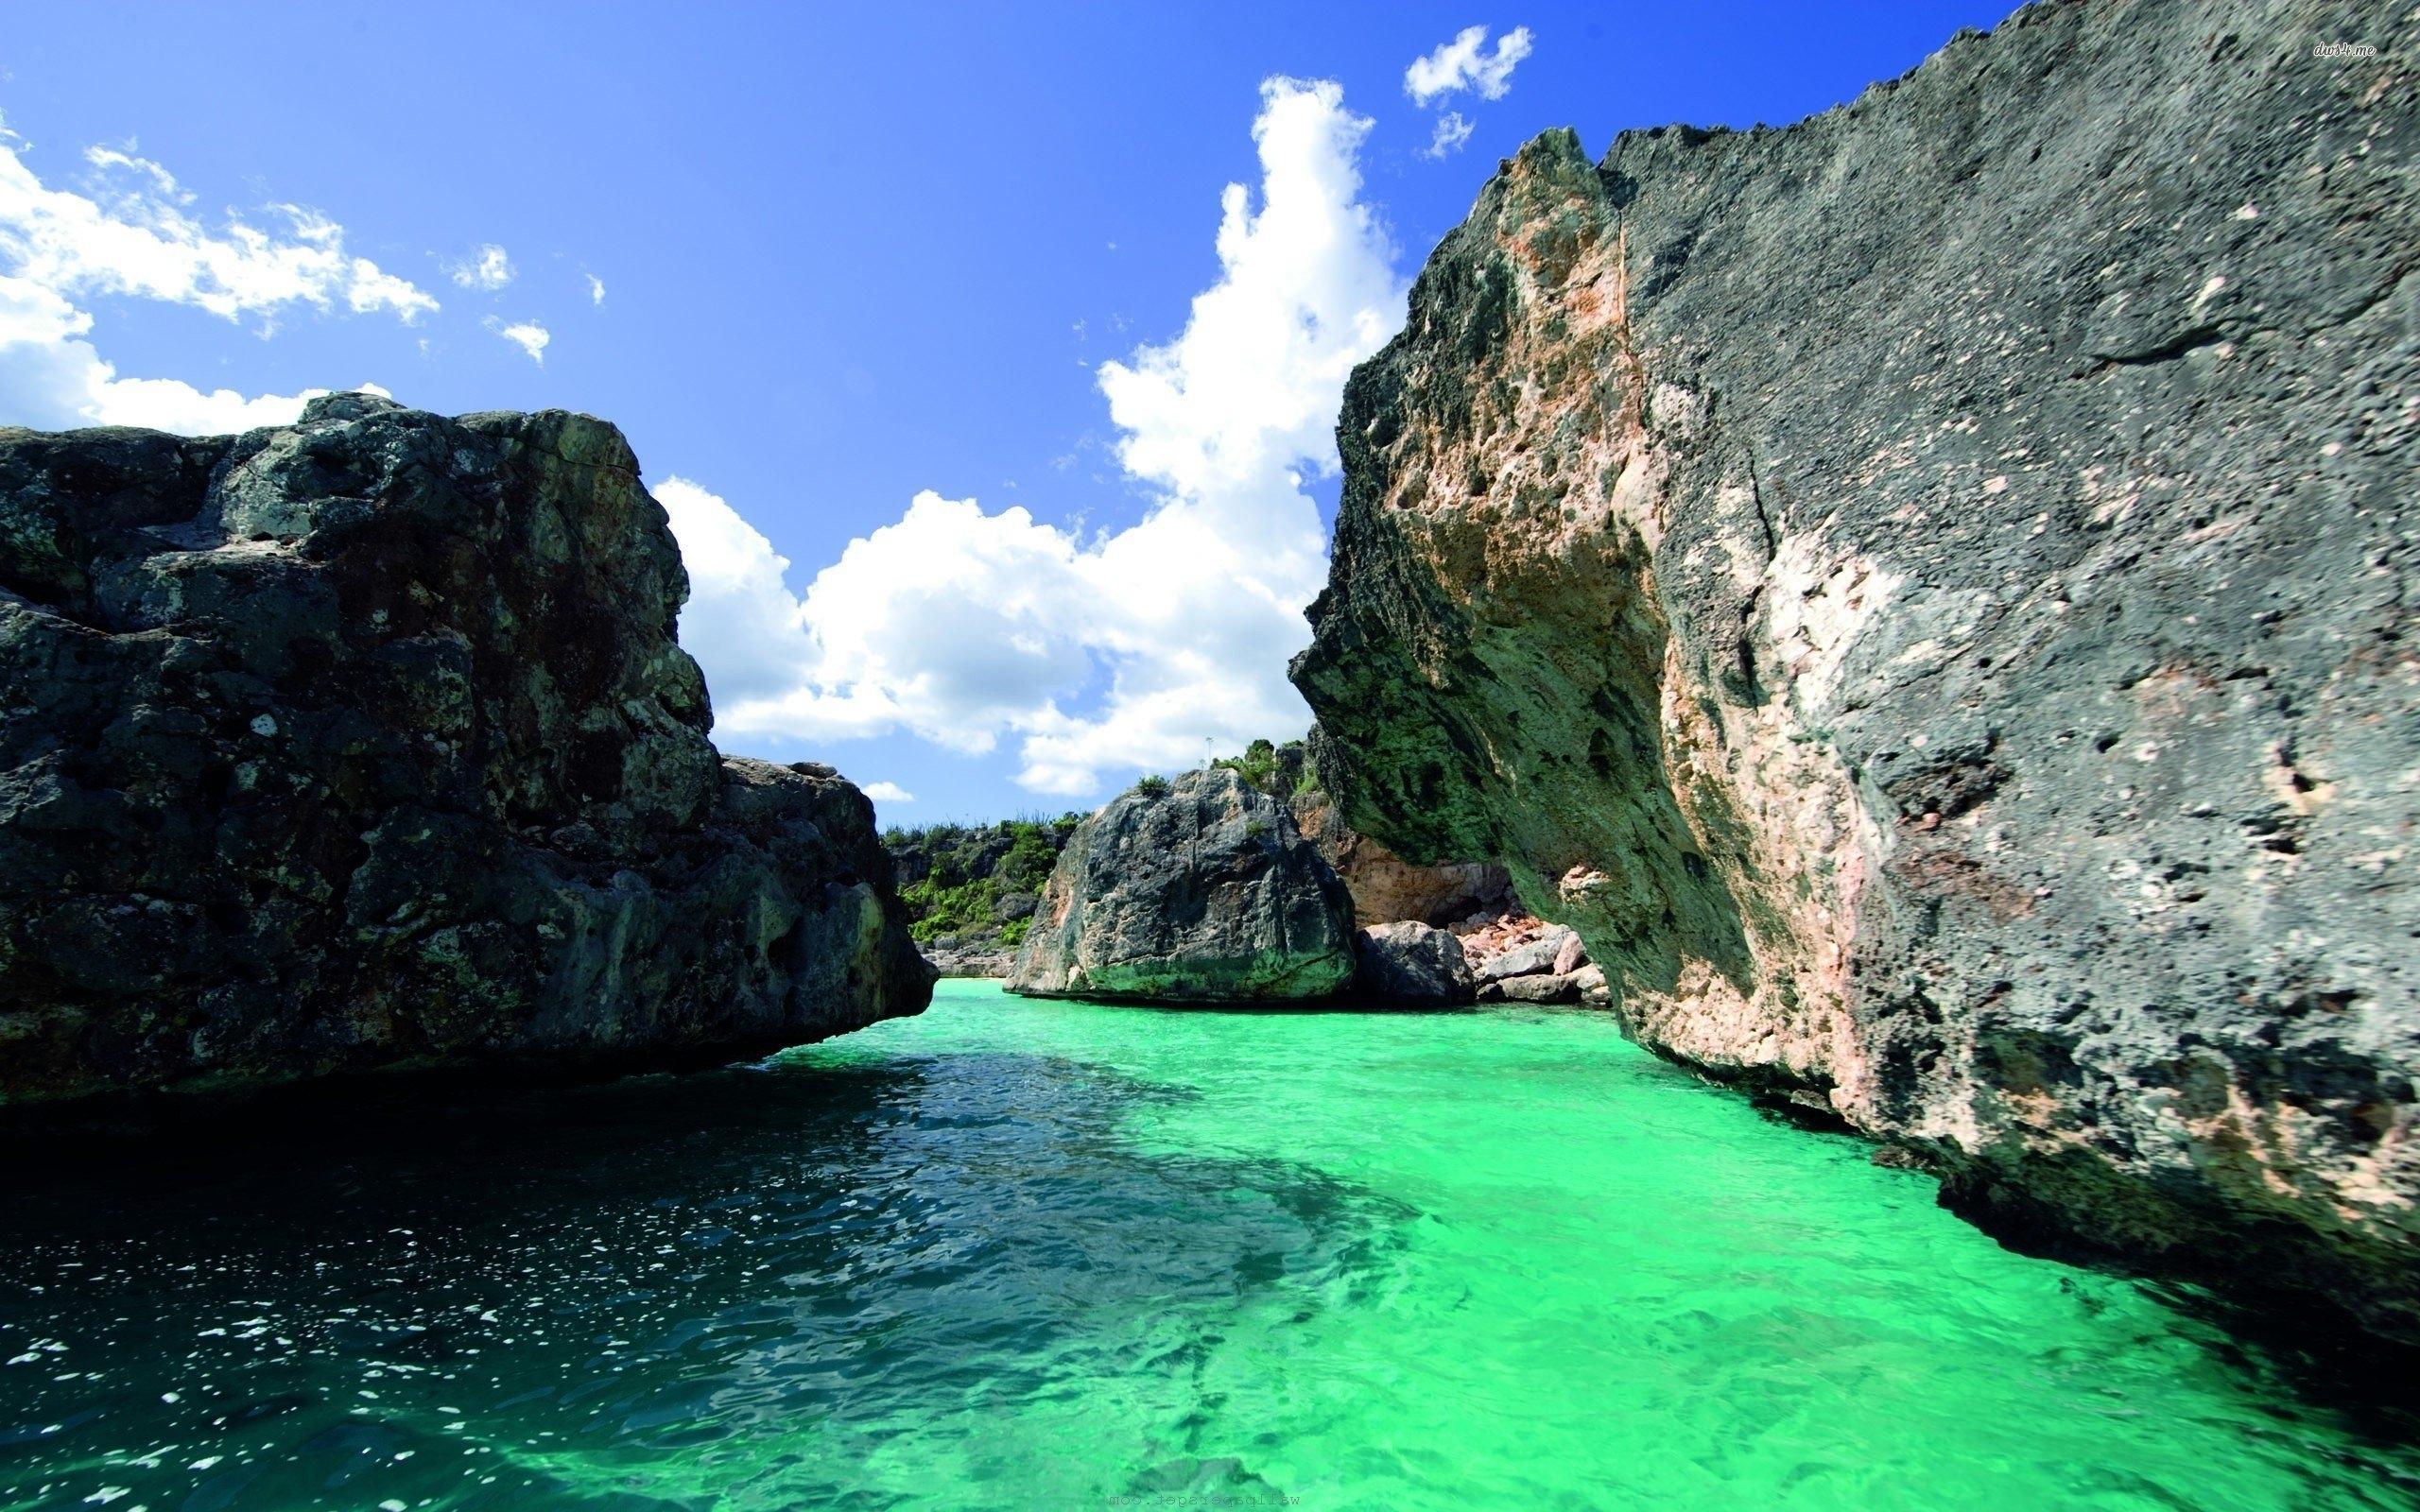 bay in the dominican republic - walldevil